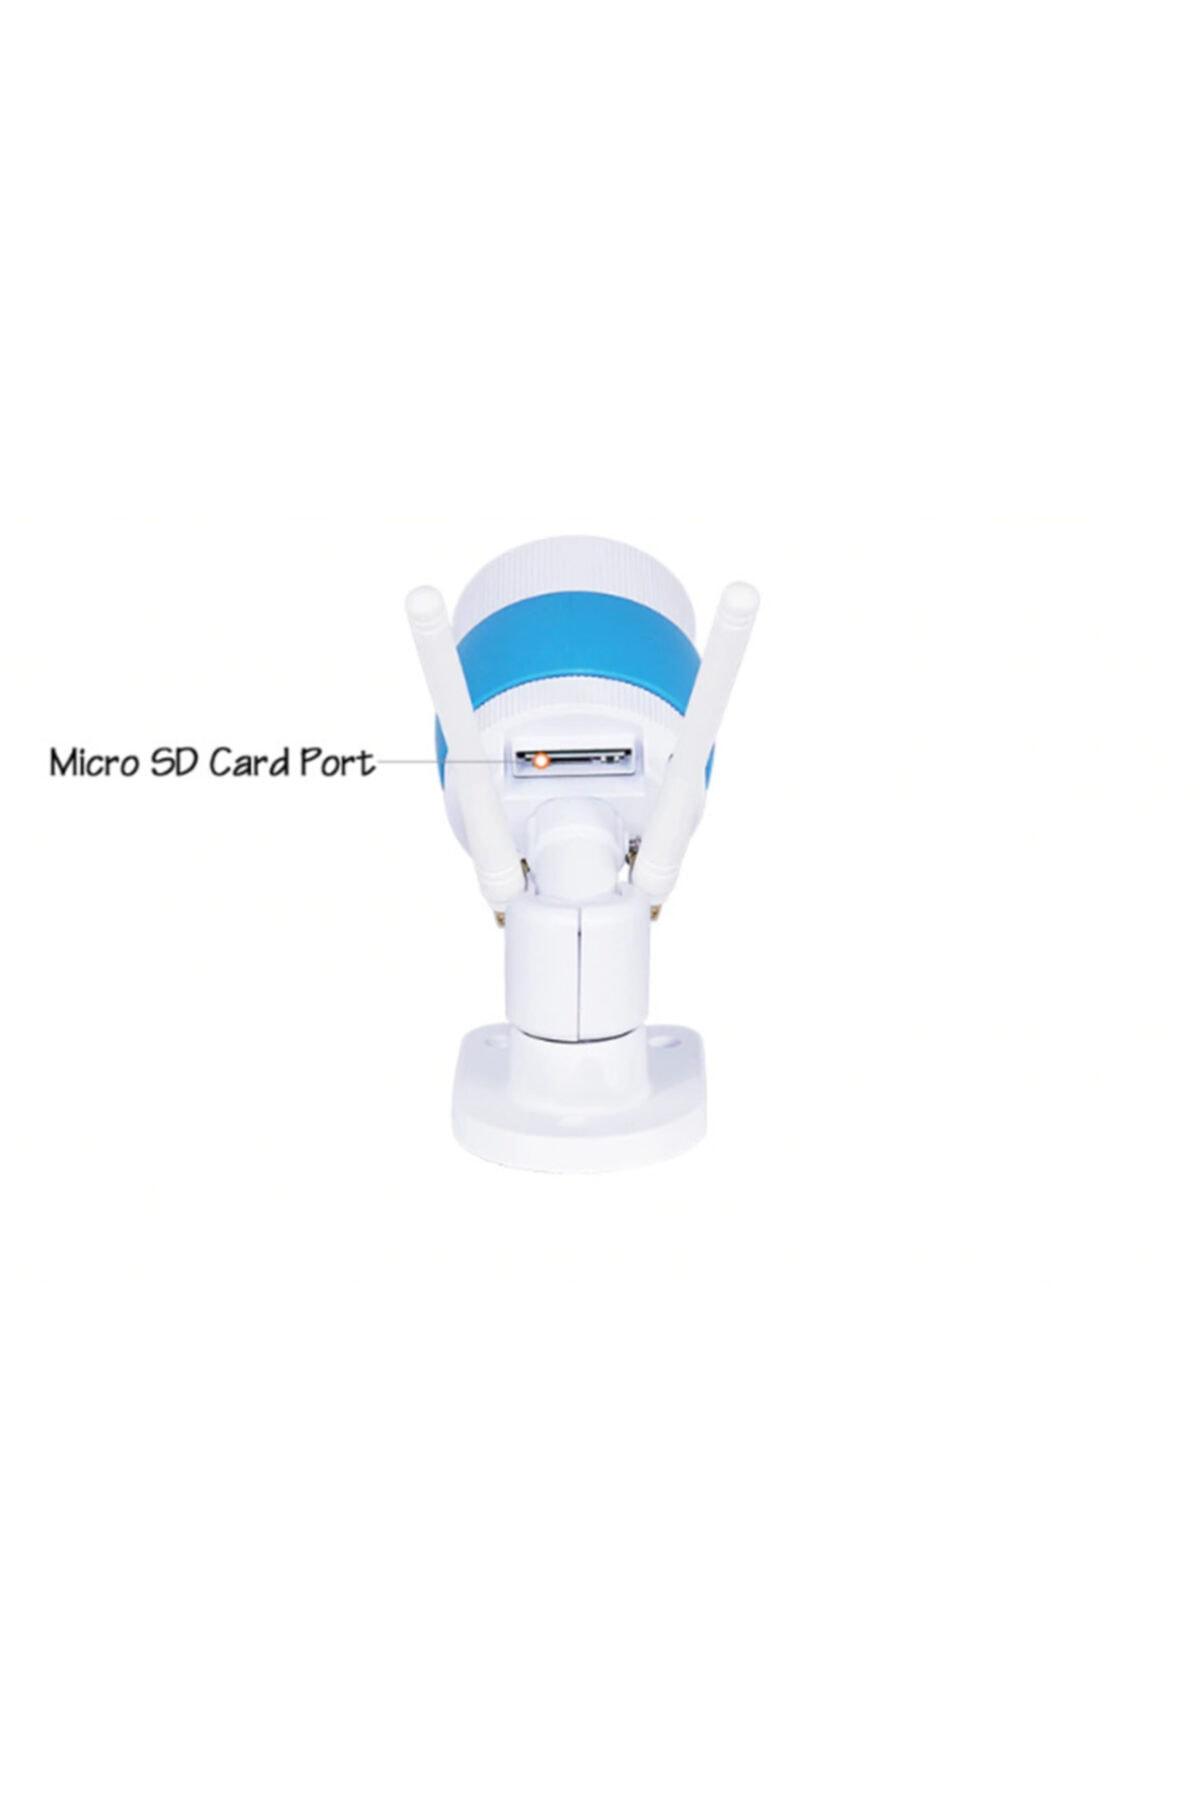 Mobitell Dış Mekan 360° 1080p Full Hd Wi-fi Ip Güvenlik Kamerası